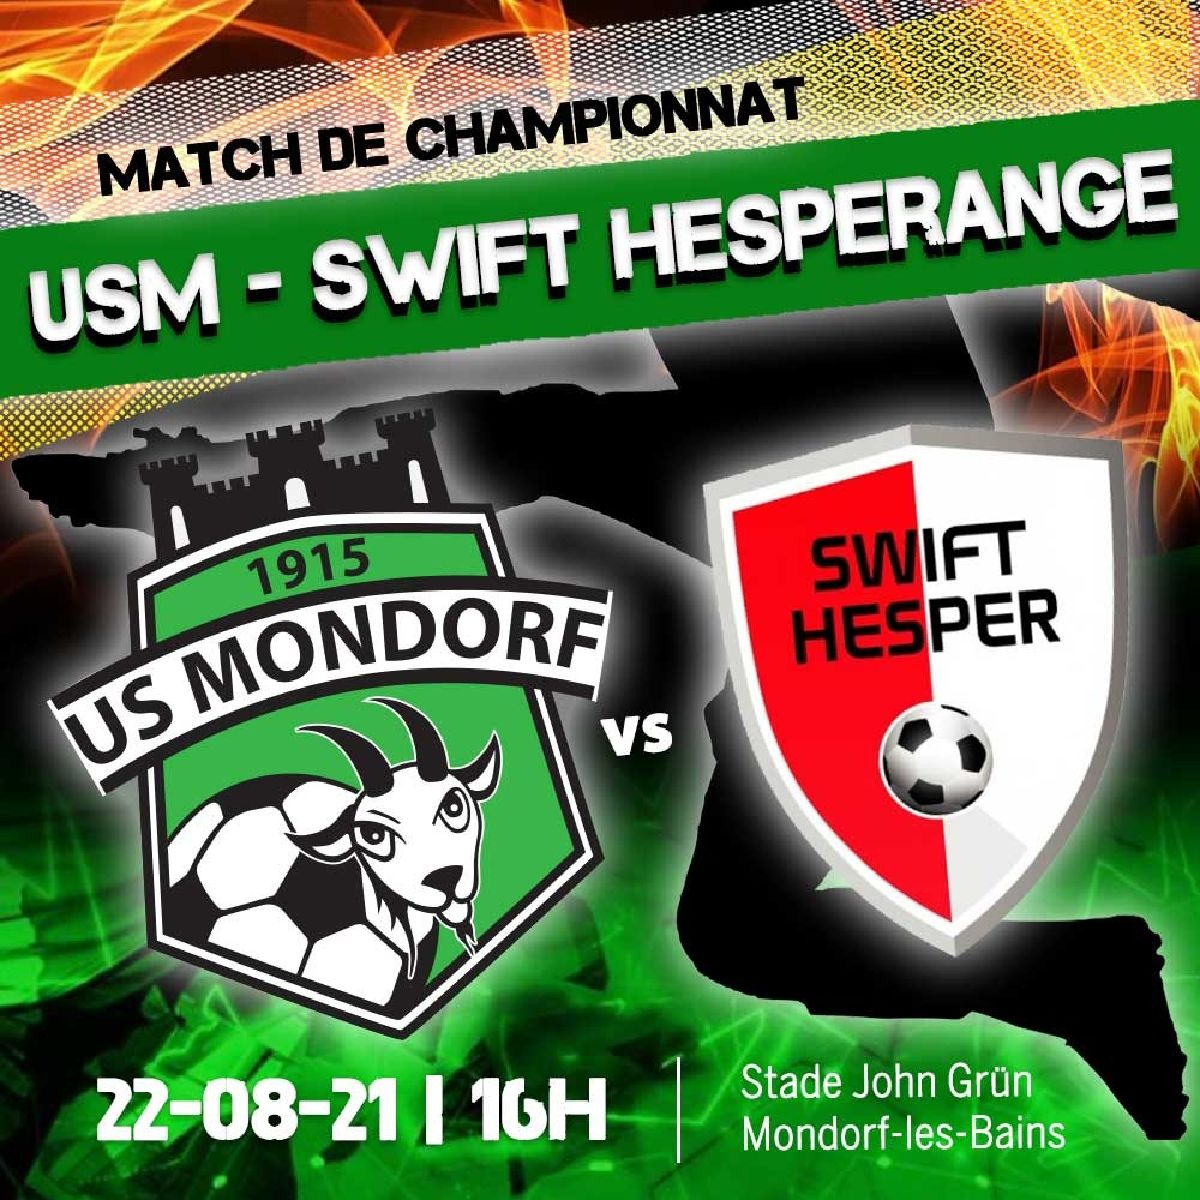 US Mondorf - Swift Hesperange